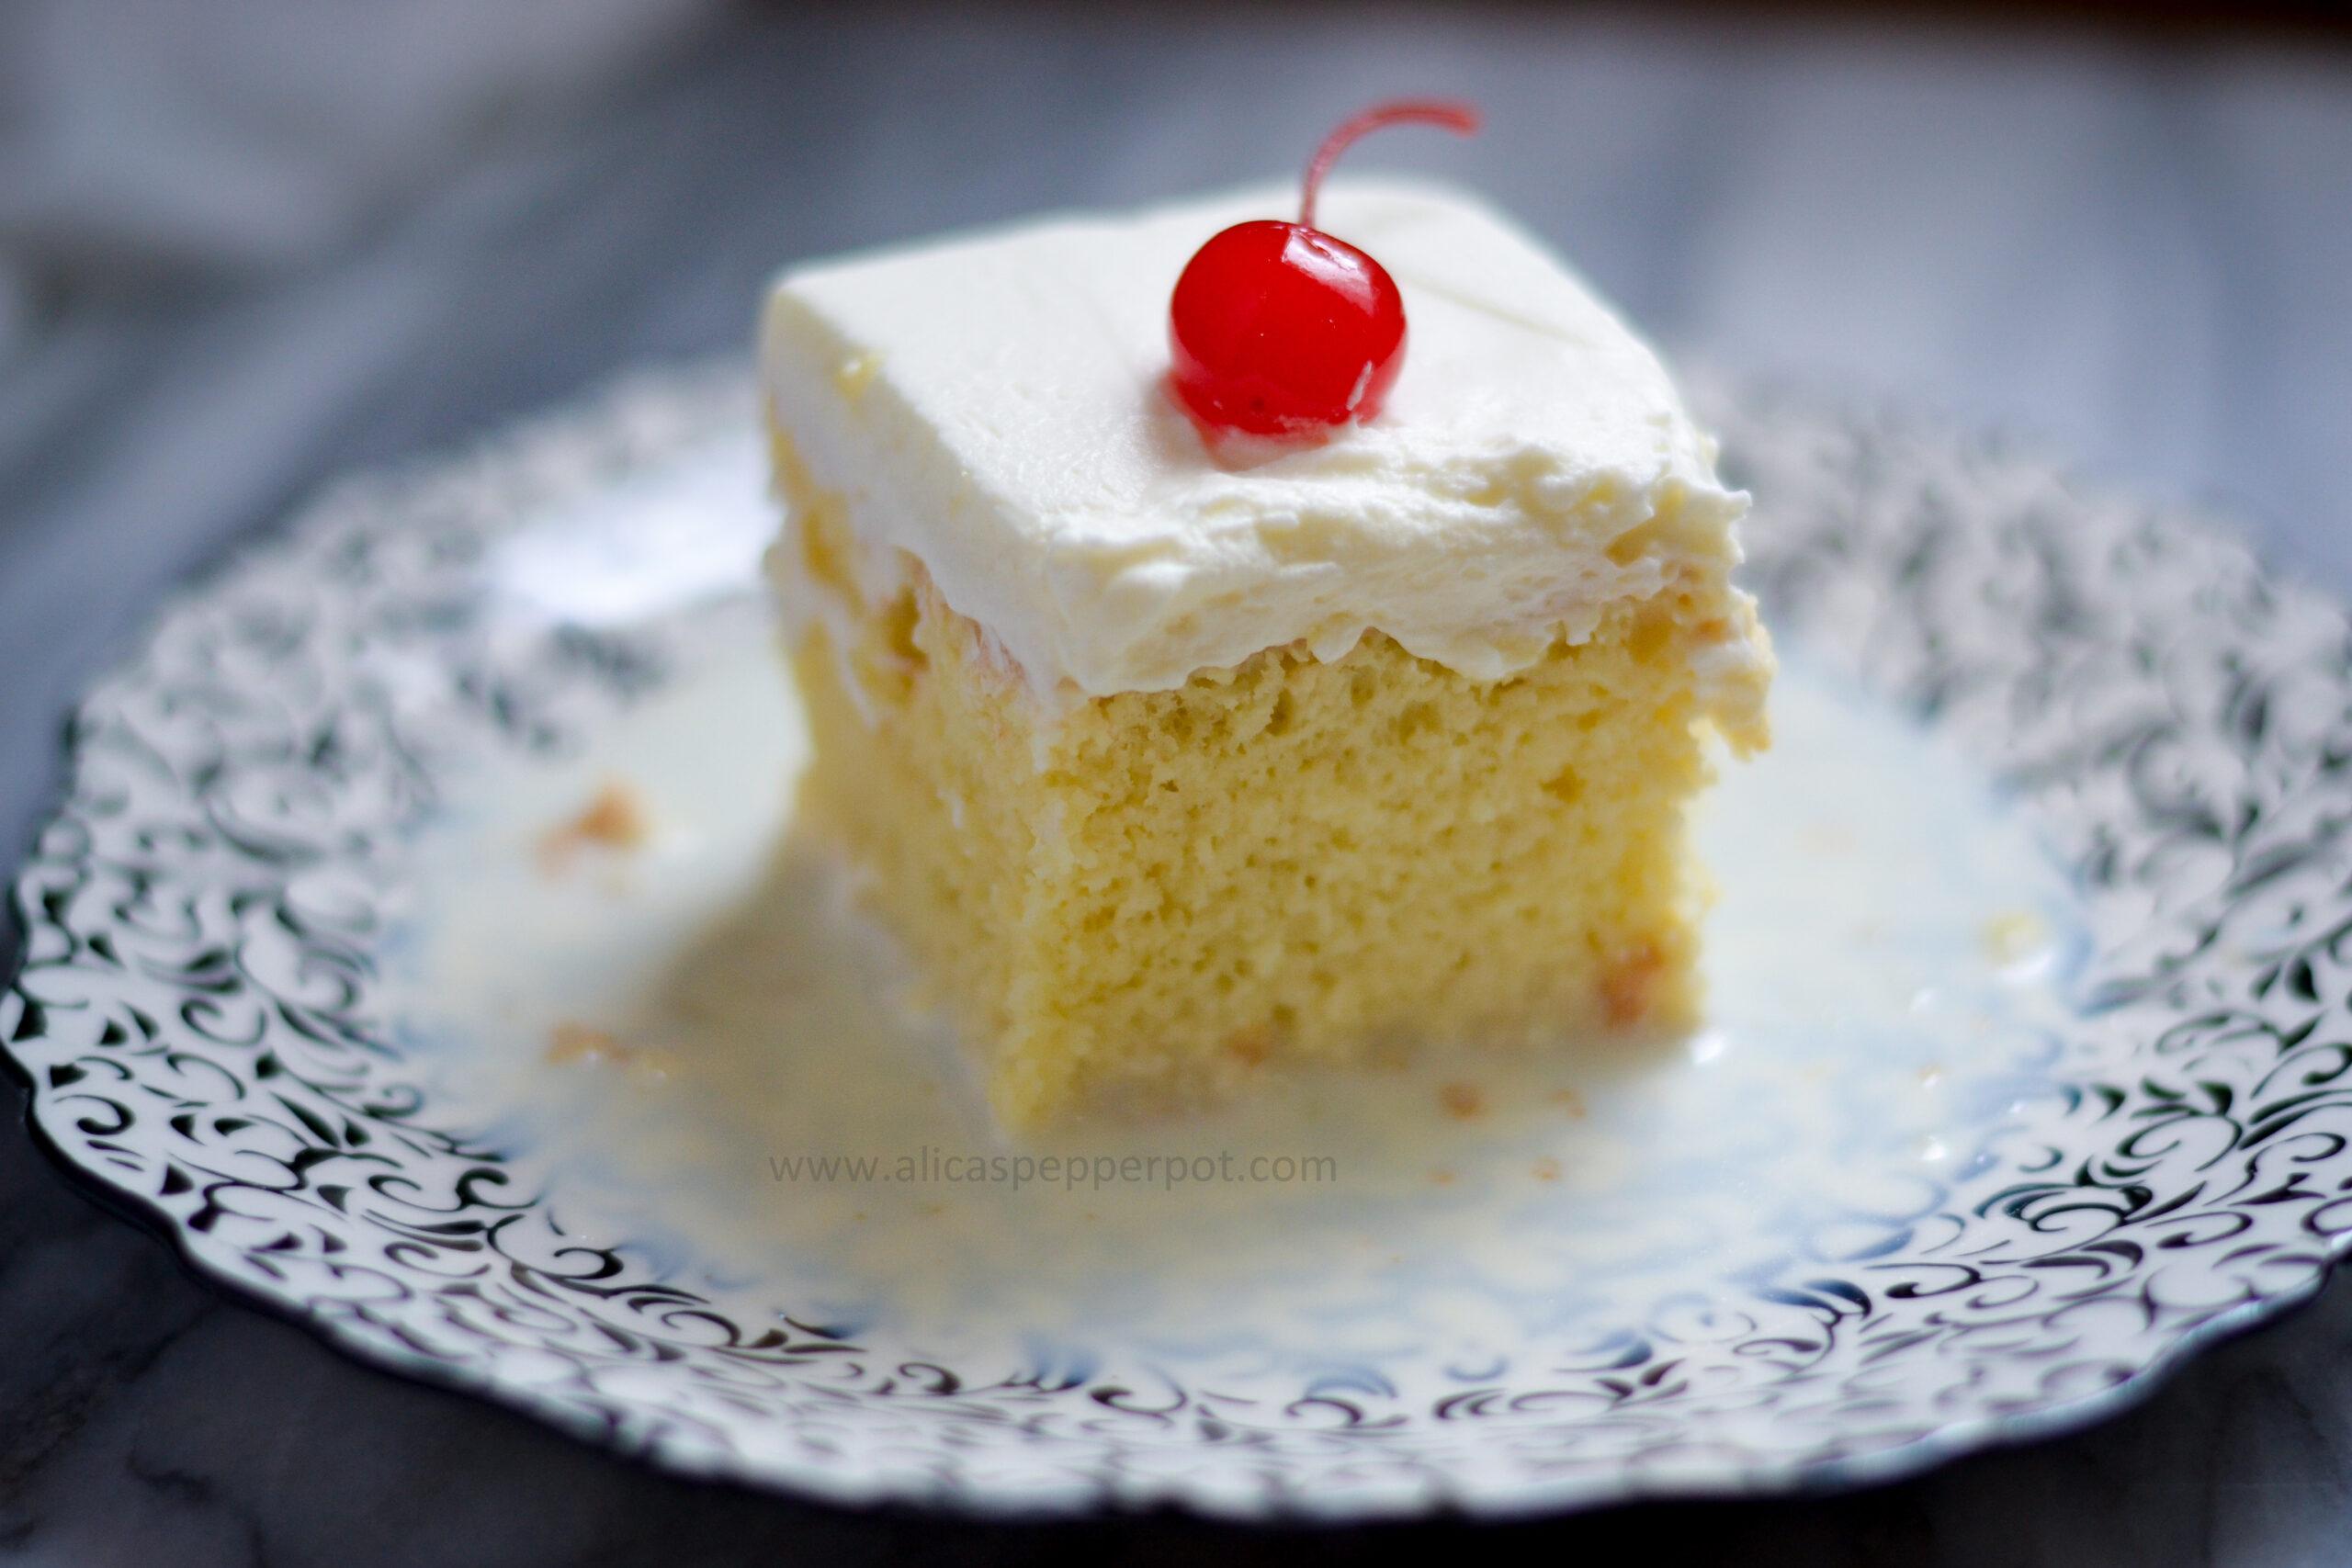 Tres Leches Cake - Alica's Pepperpot